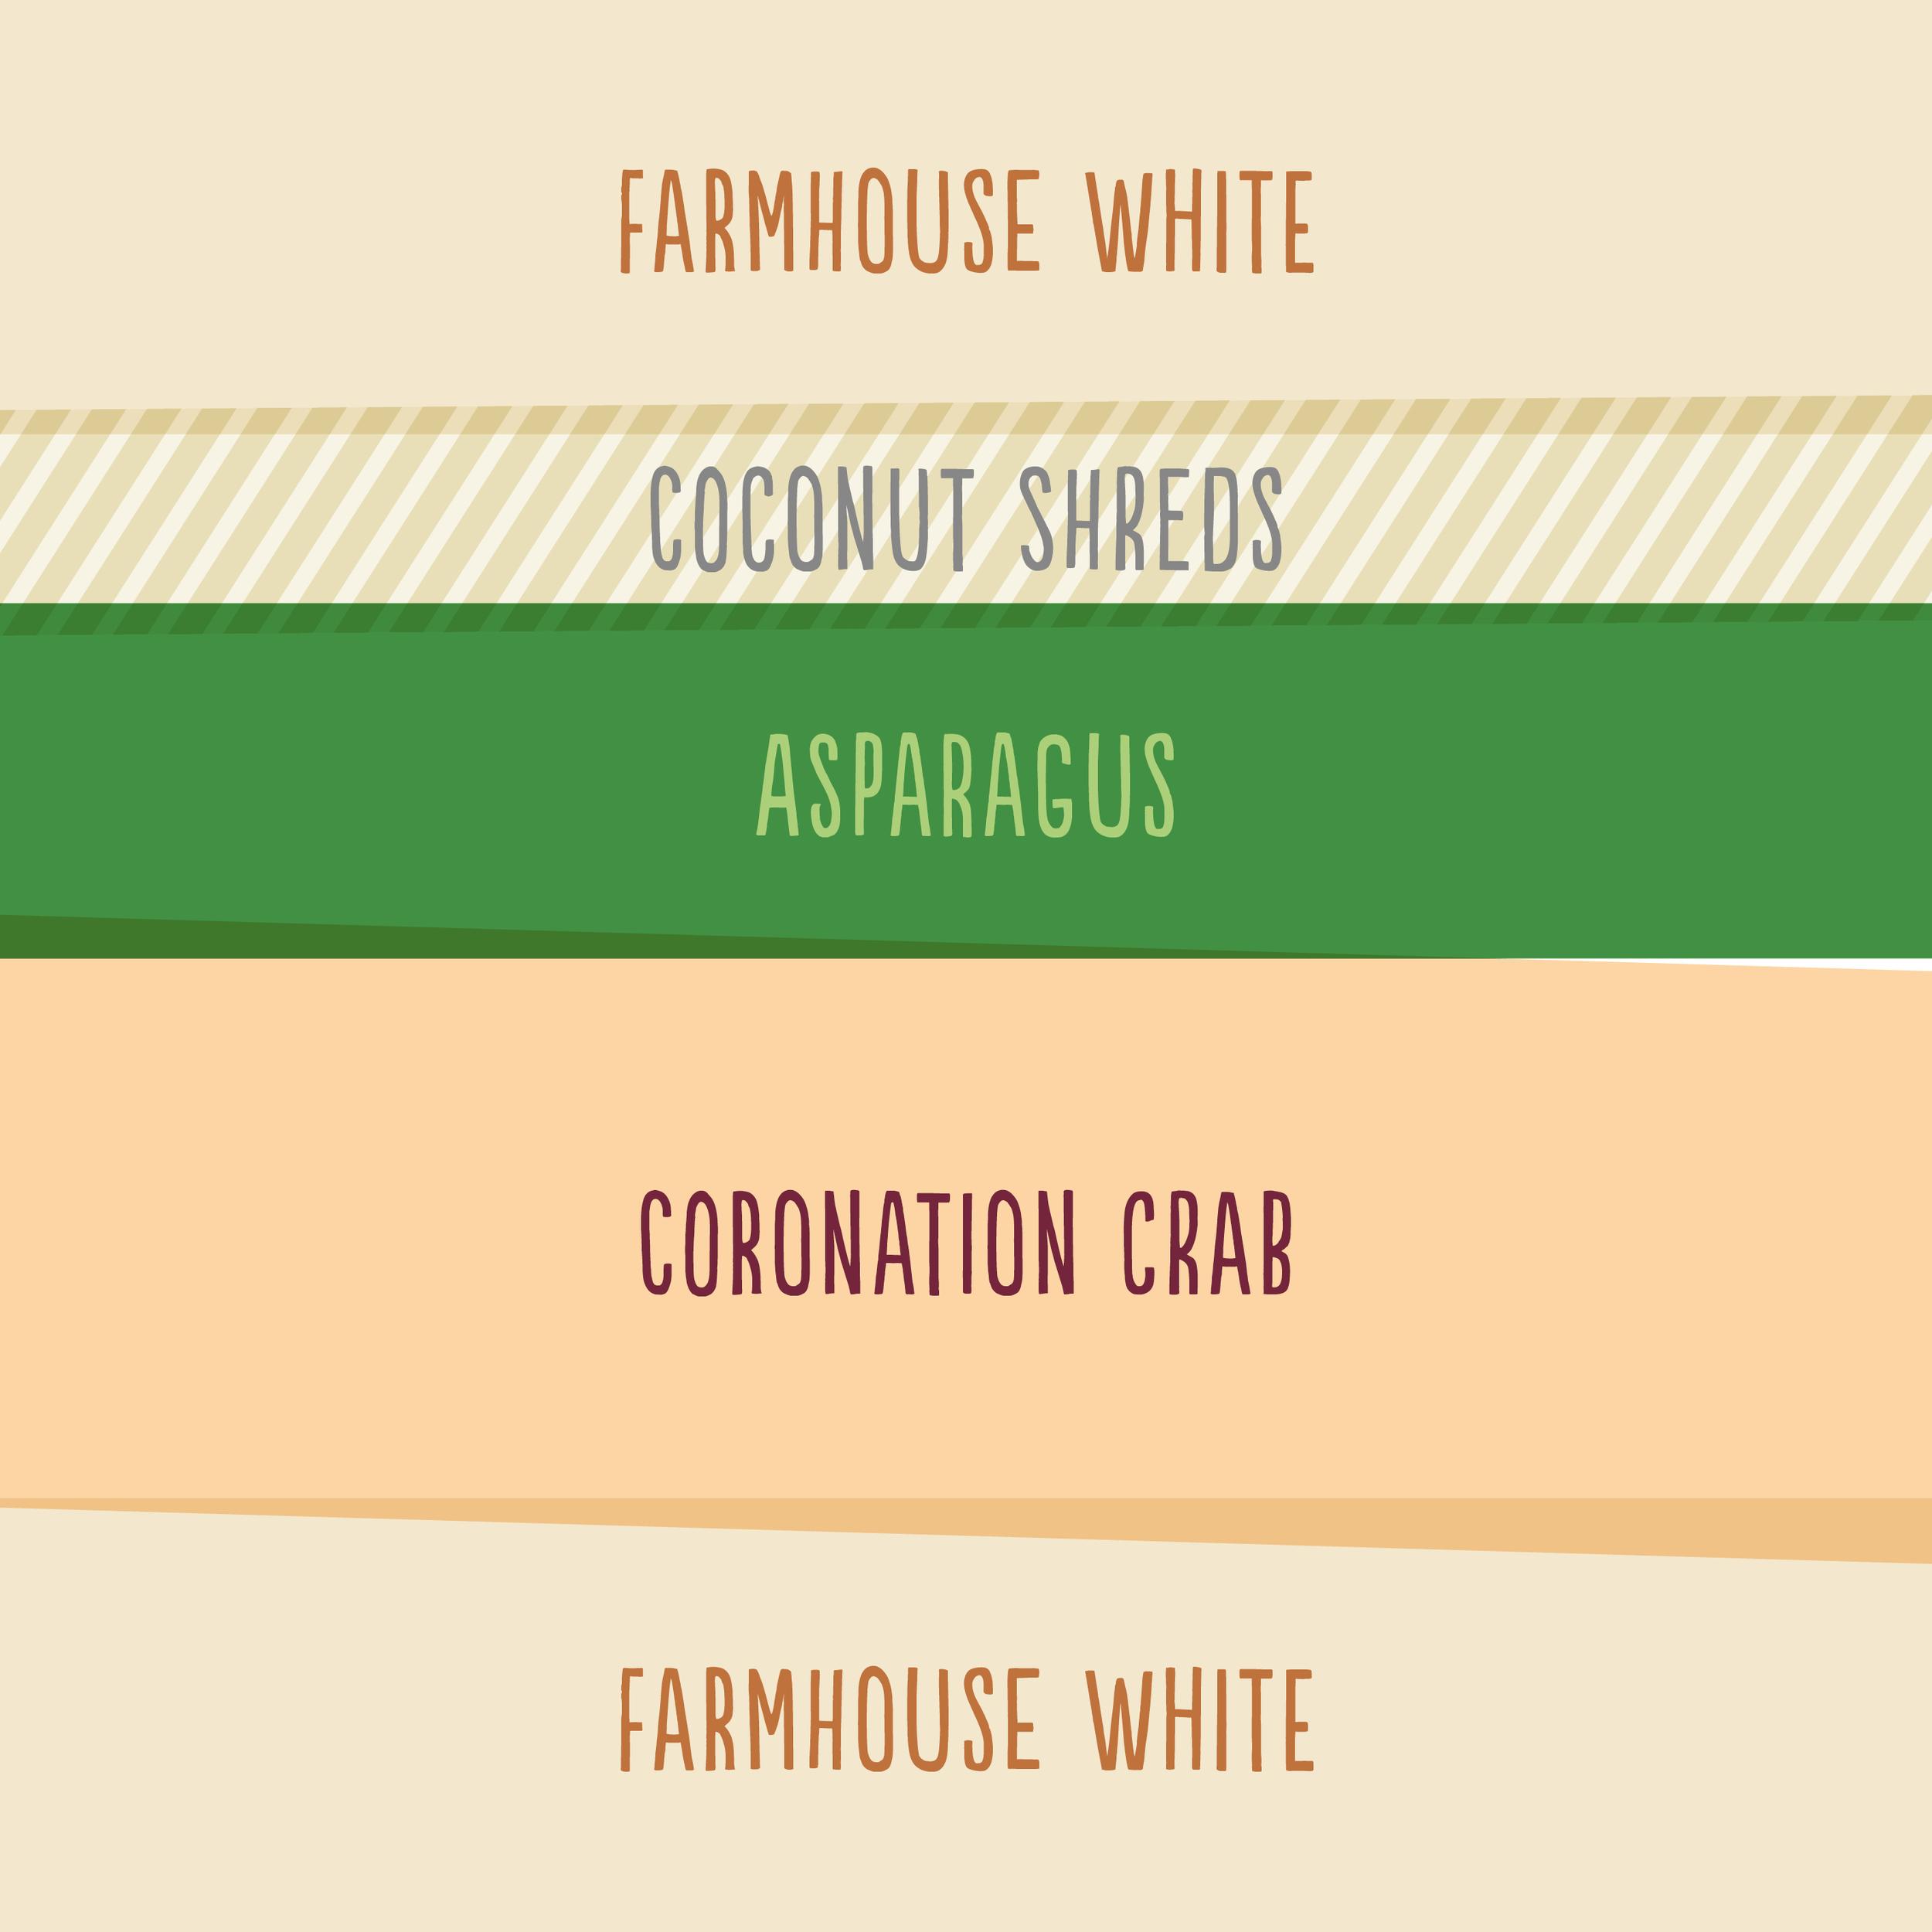 Coronation-crab-sandwich.jpg